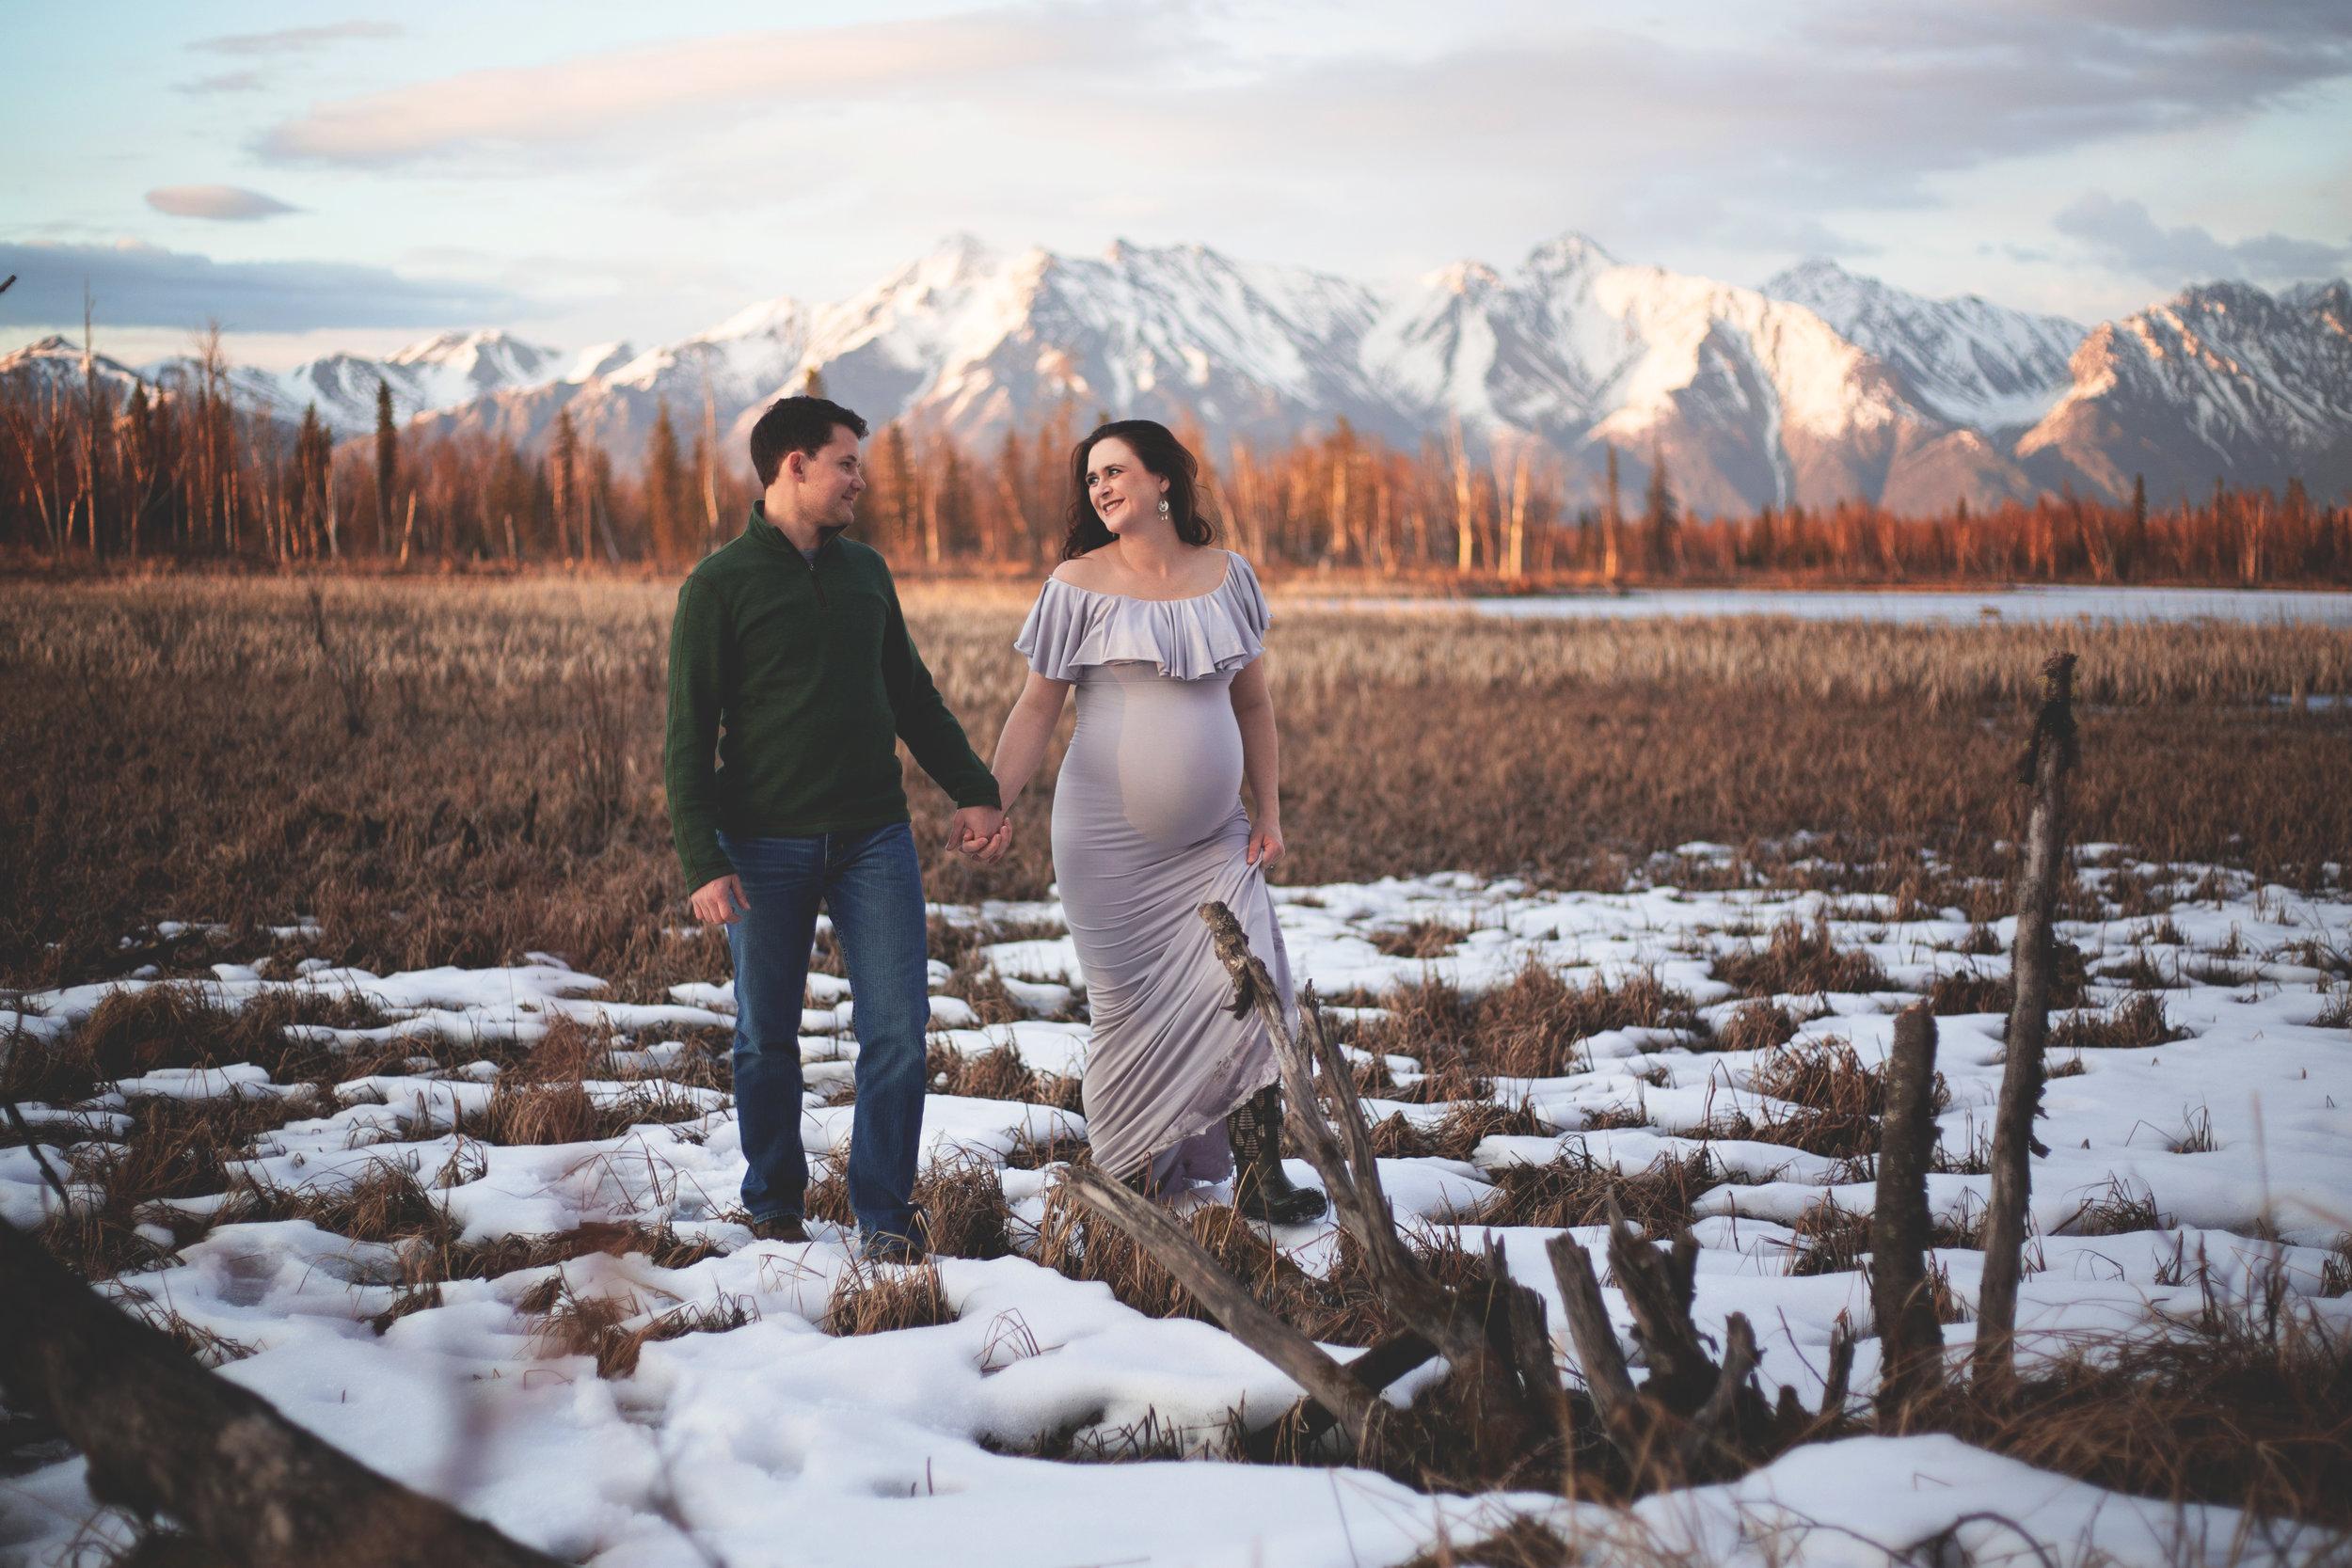 anchorage-maternity-photographer-17.jpg